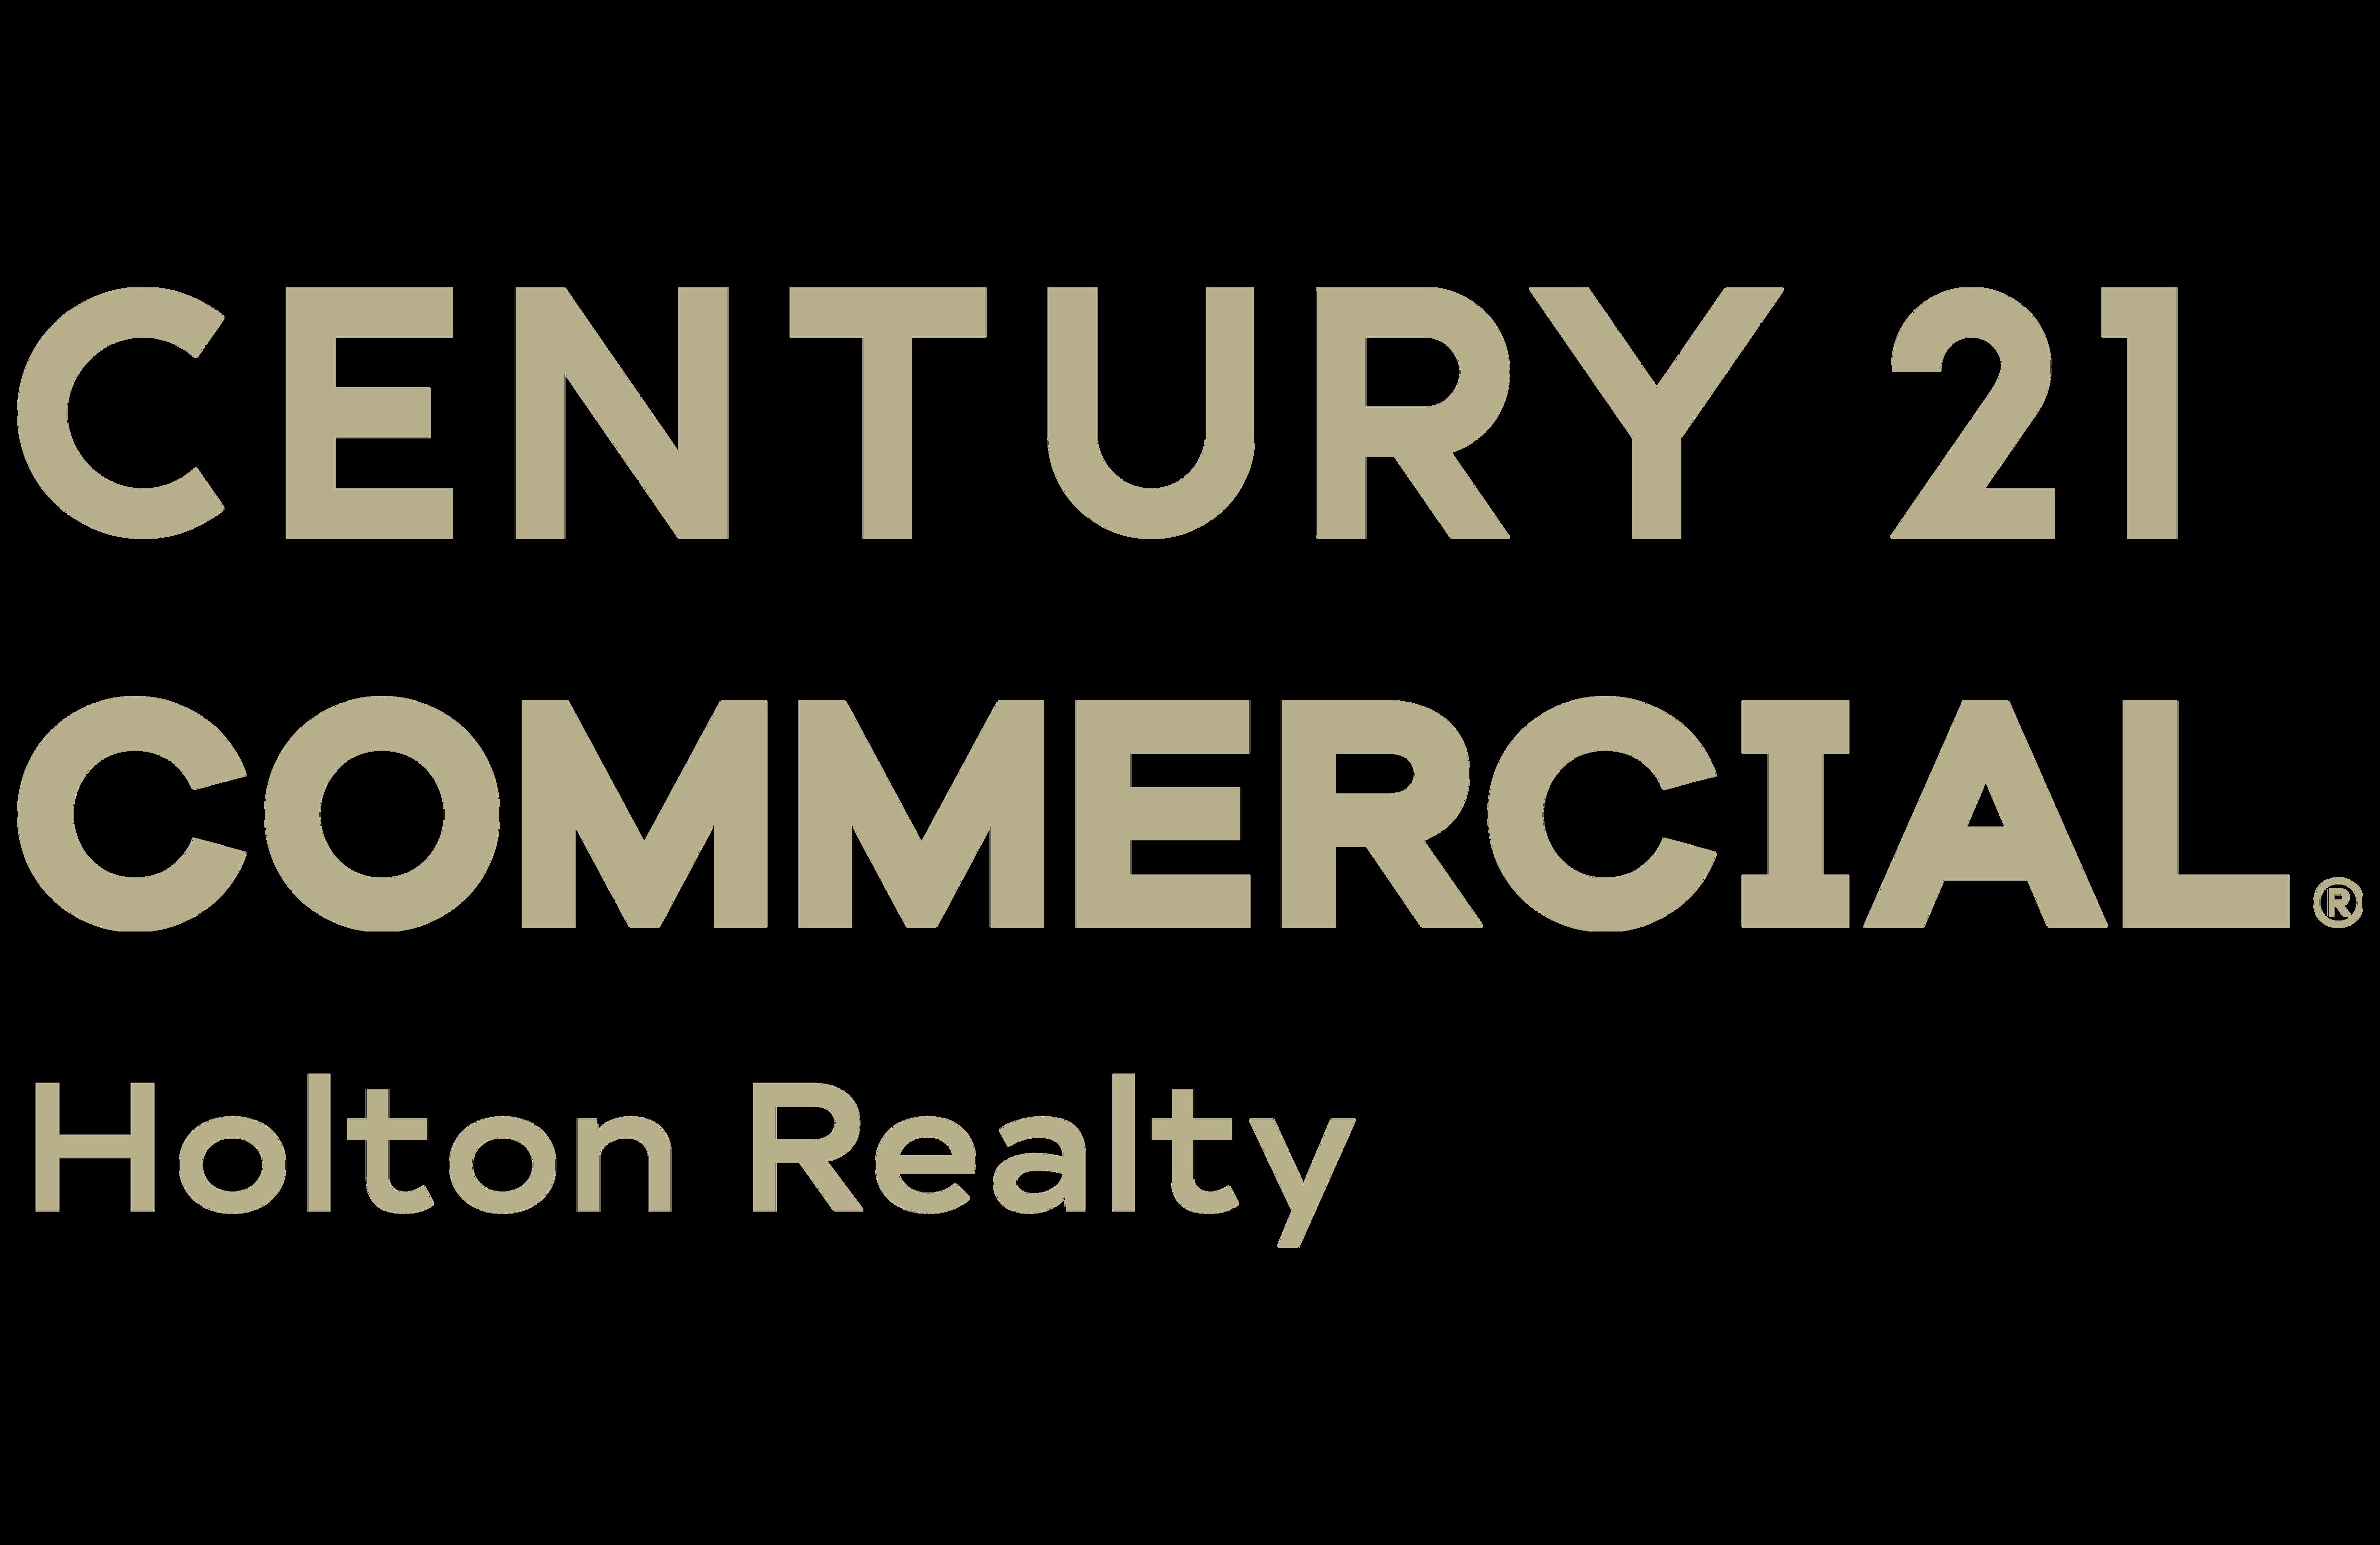 CENTURY 21 Holton Realty